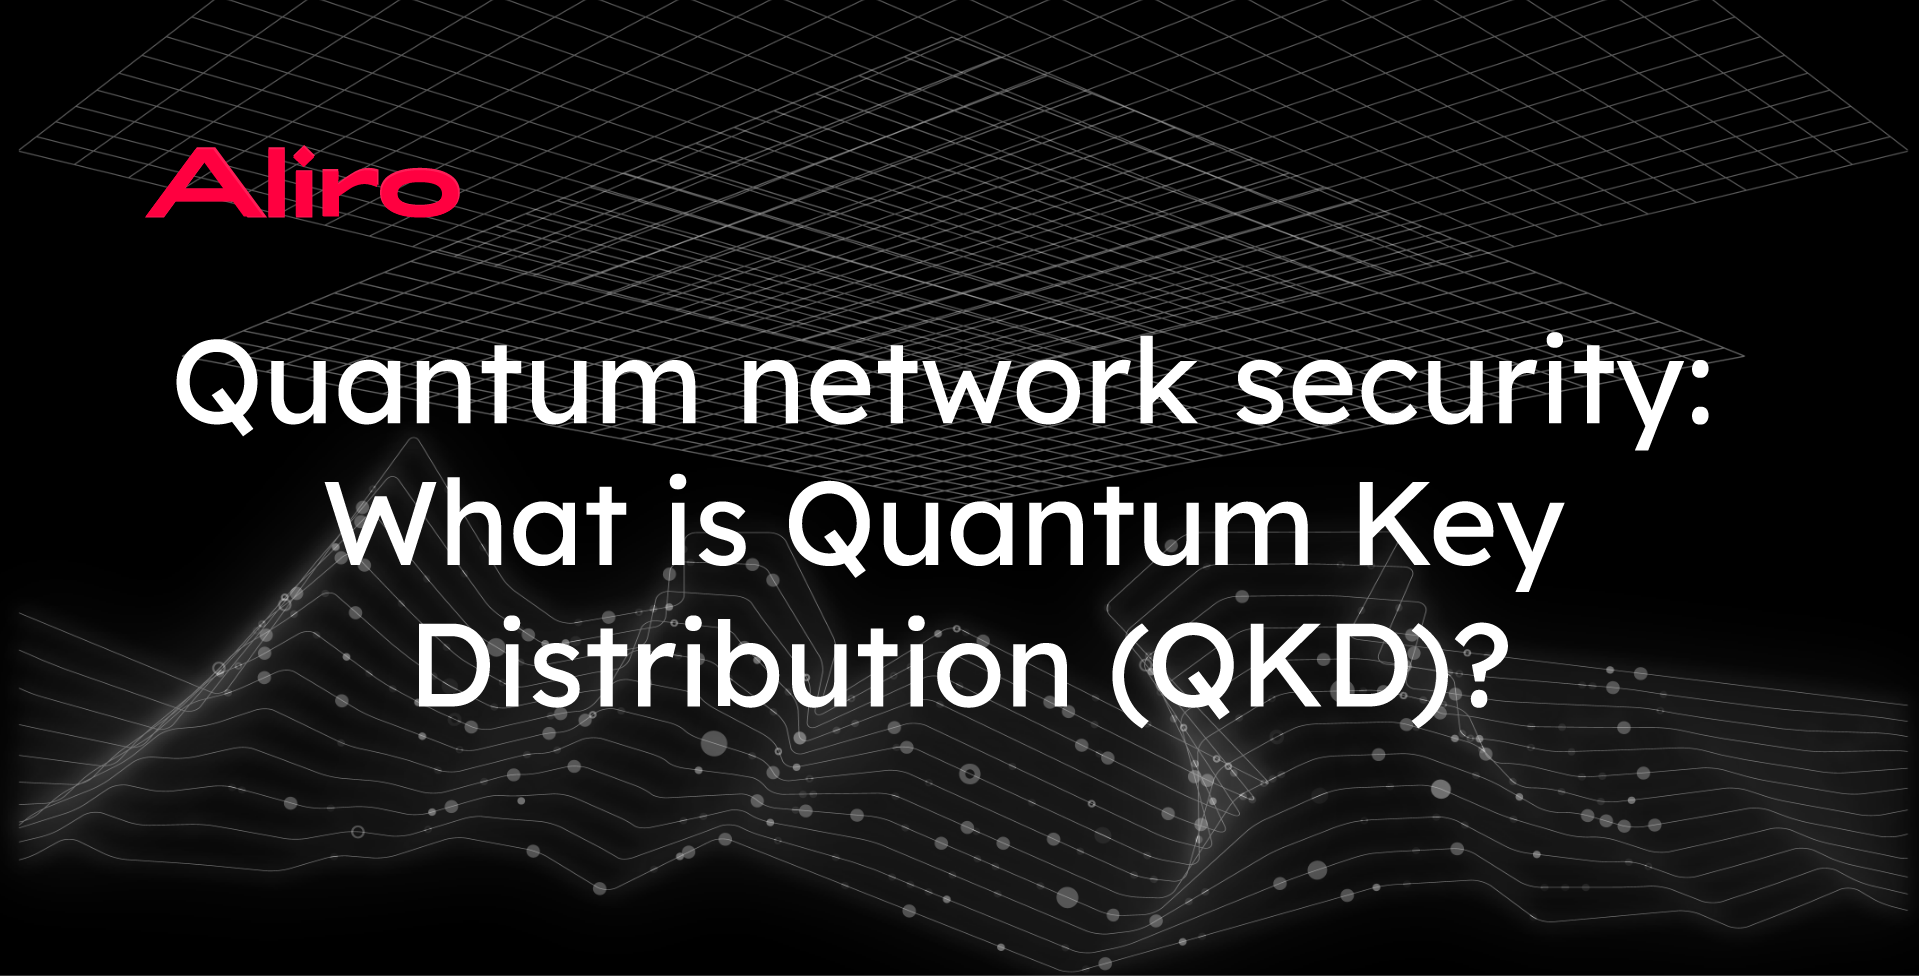 Quantum network security: What is Quantum Key Distribution (QKD)?